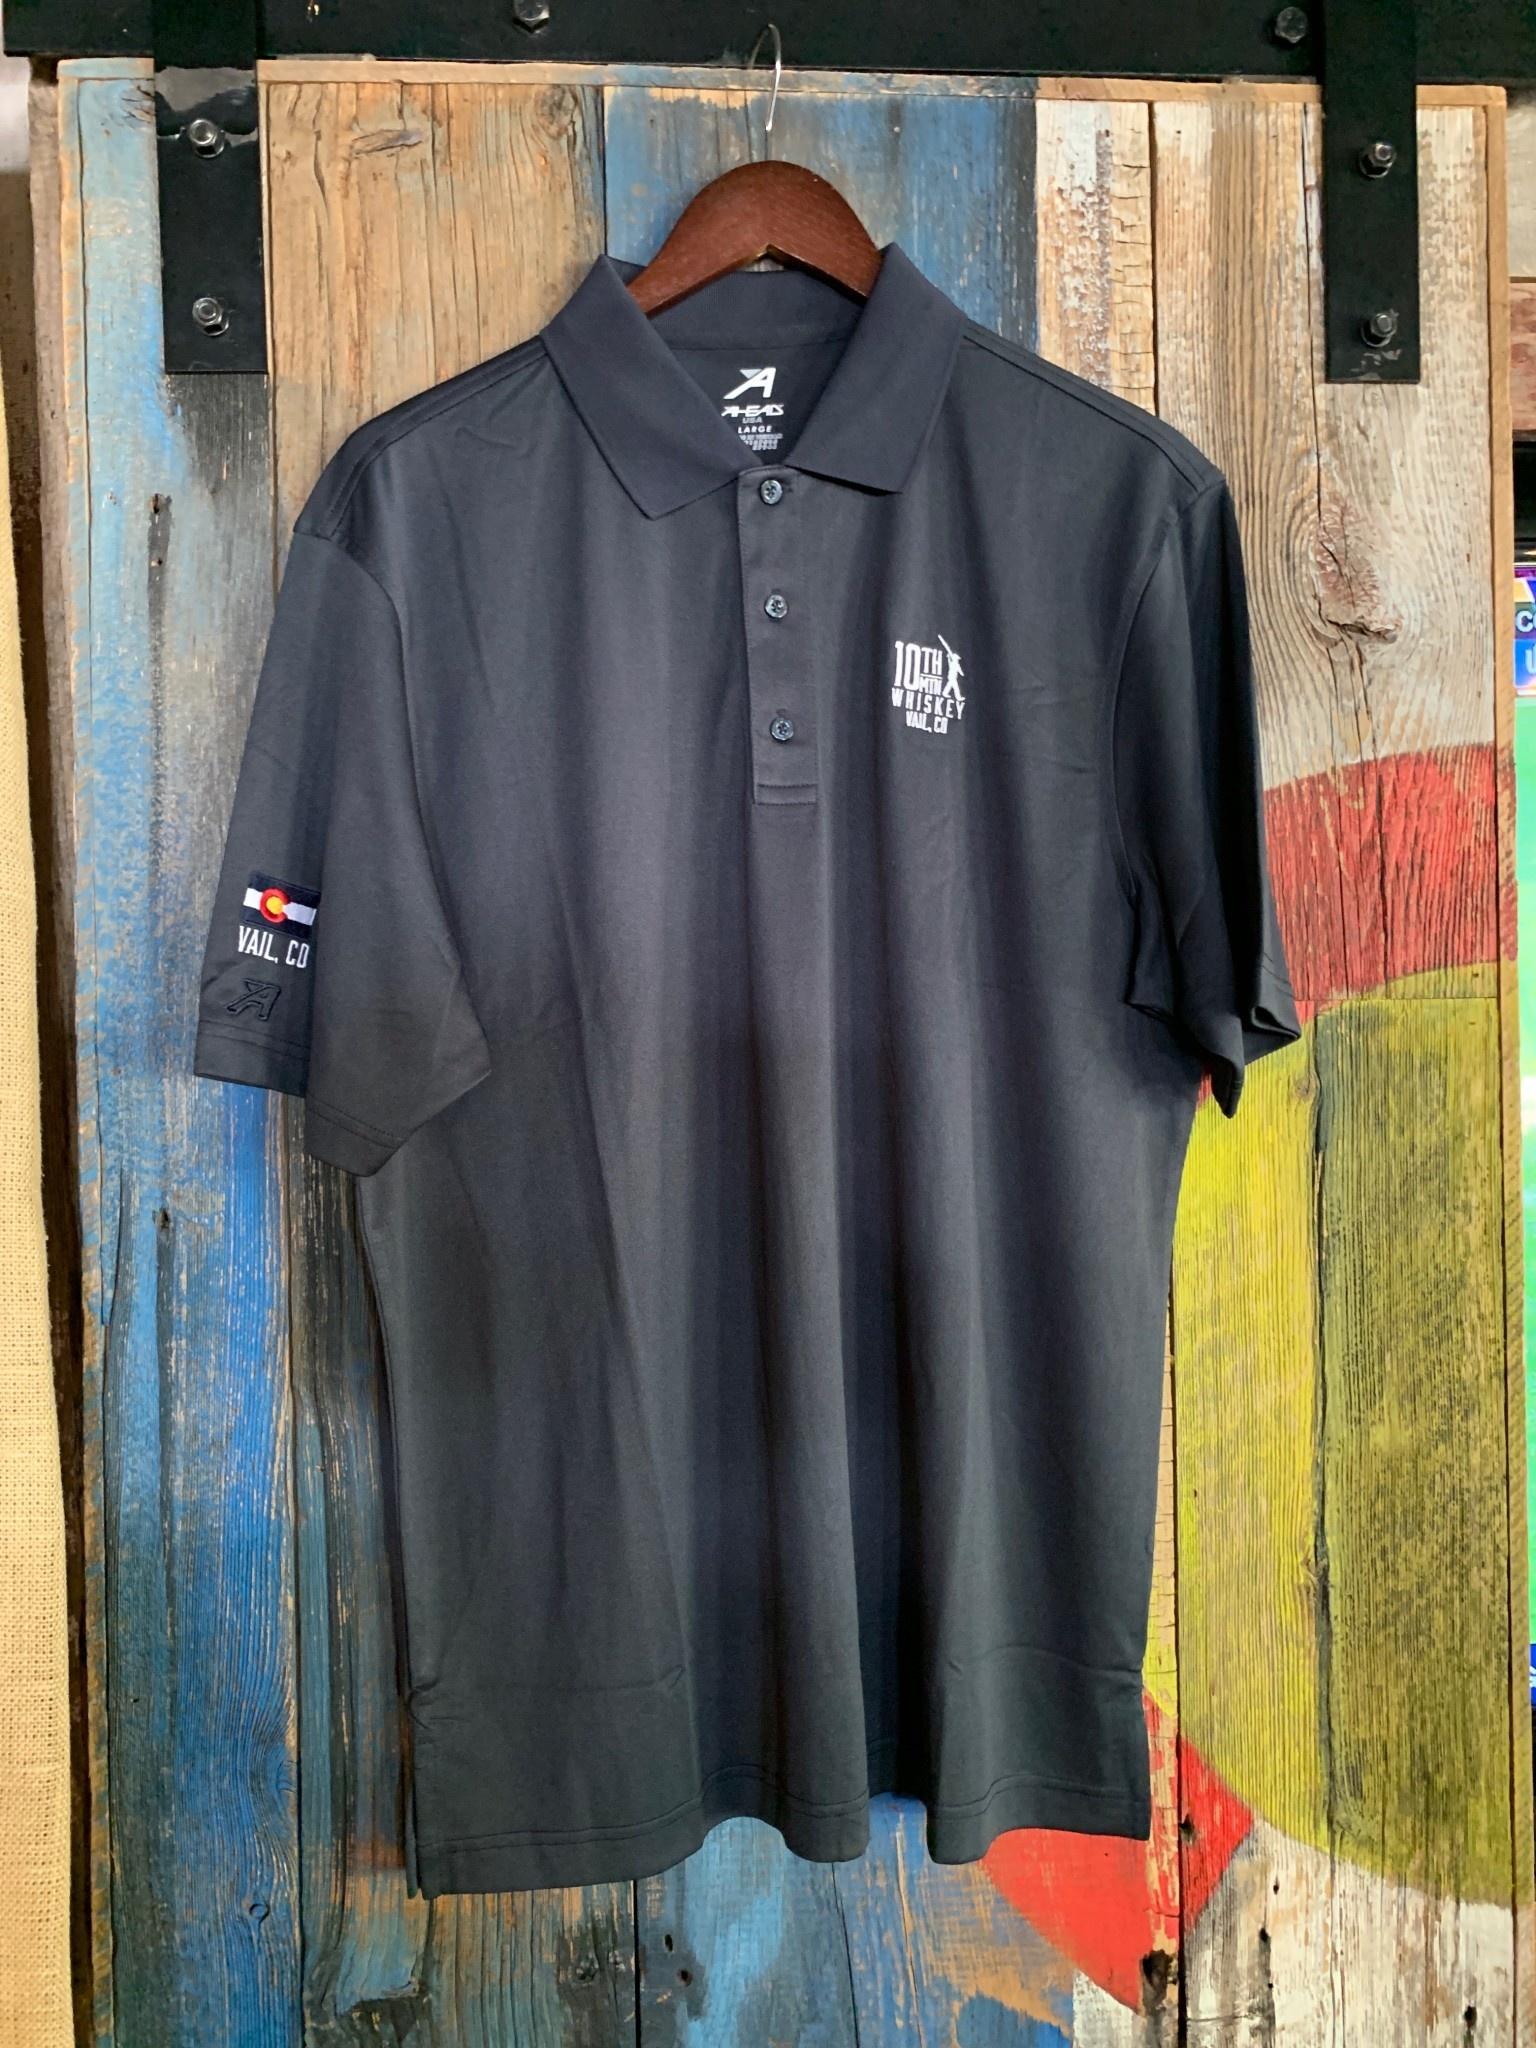 10th Mountain Whiskey & Spirit Co. Men's Golf Shirt - Navy  2XL